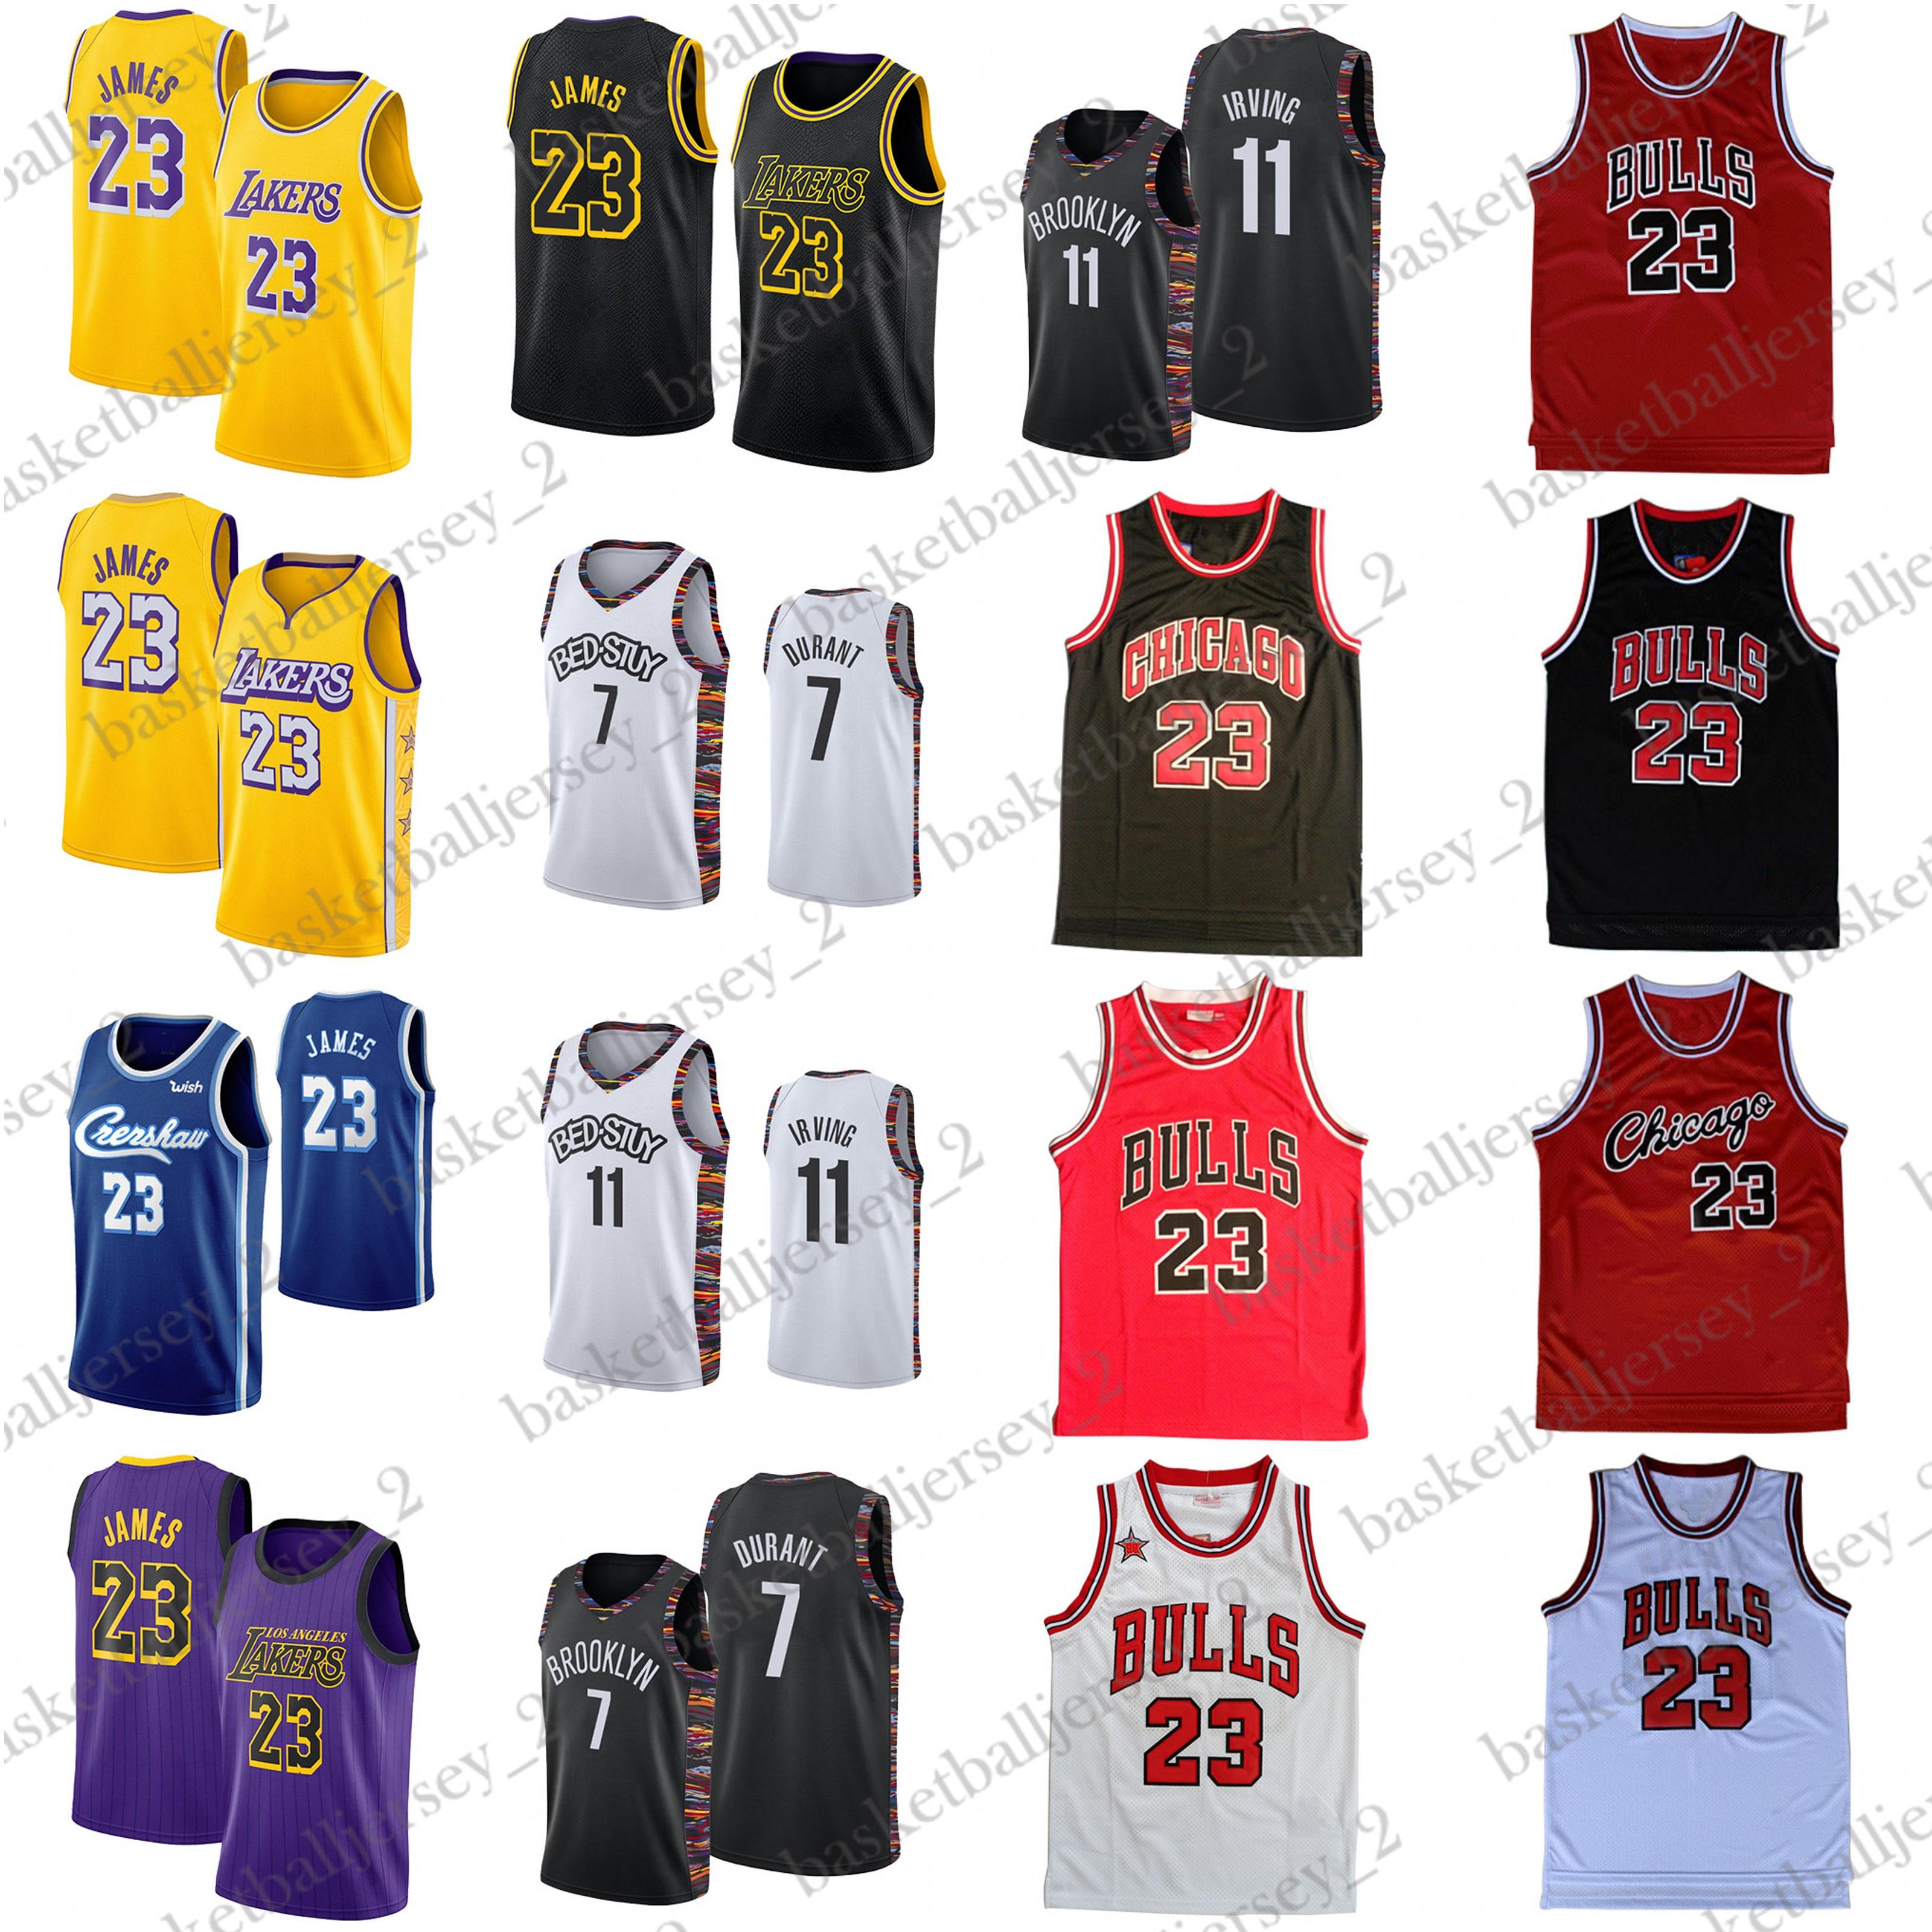 CCKWX Camiseta Cl/ásica Boston Celtics # 36 Marcus Smart Camisetas De Baloncesto Malla Bordada Baloncesto Swingman Baloncesto Camiseta Sin Mangas Cl/ásica,M:175cm//65~75kg